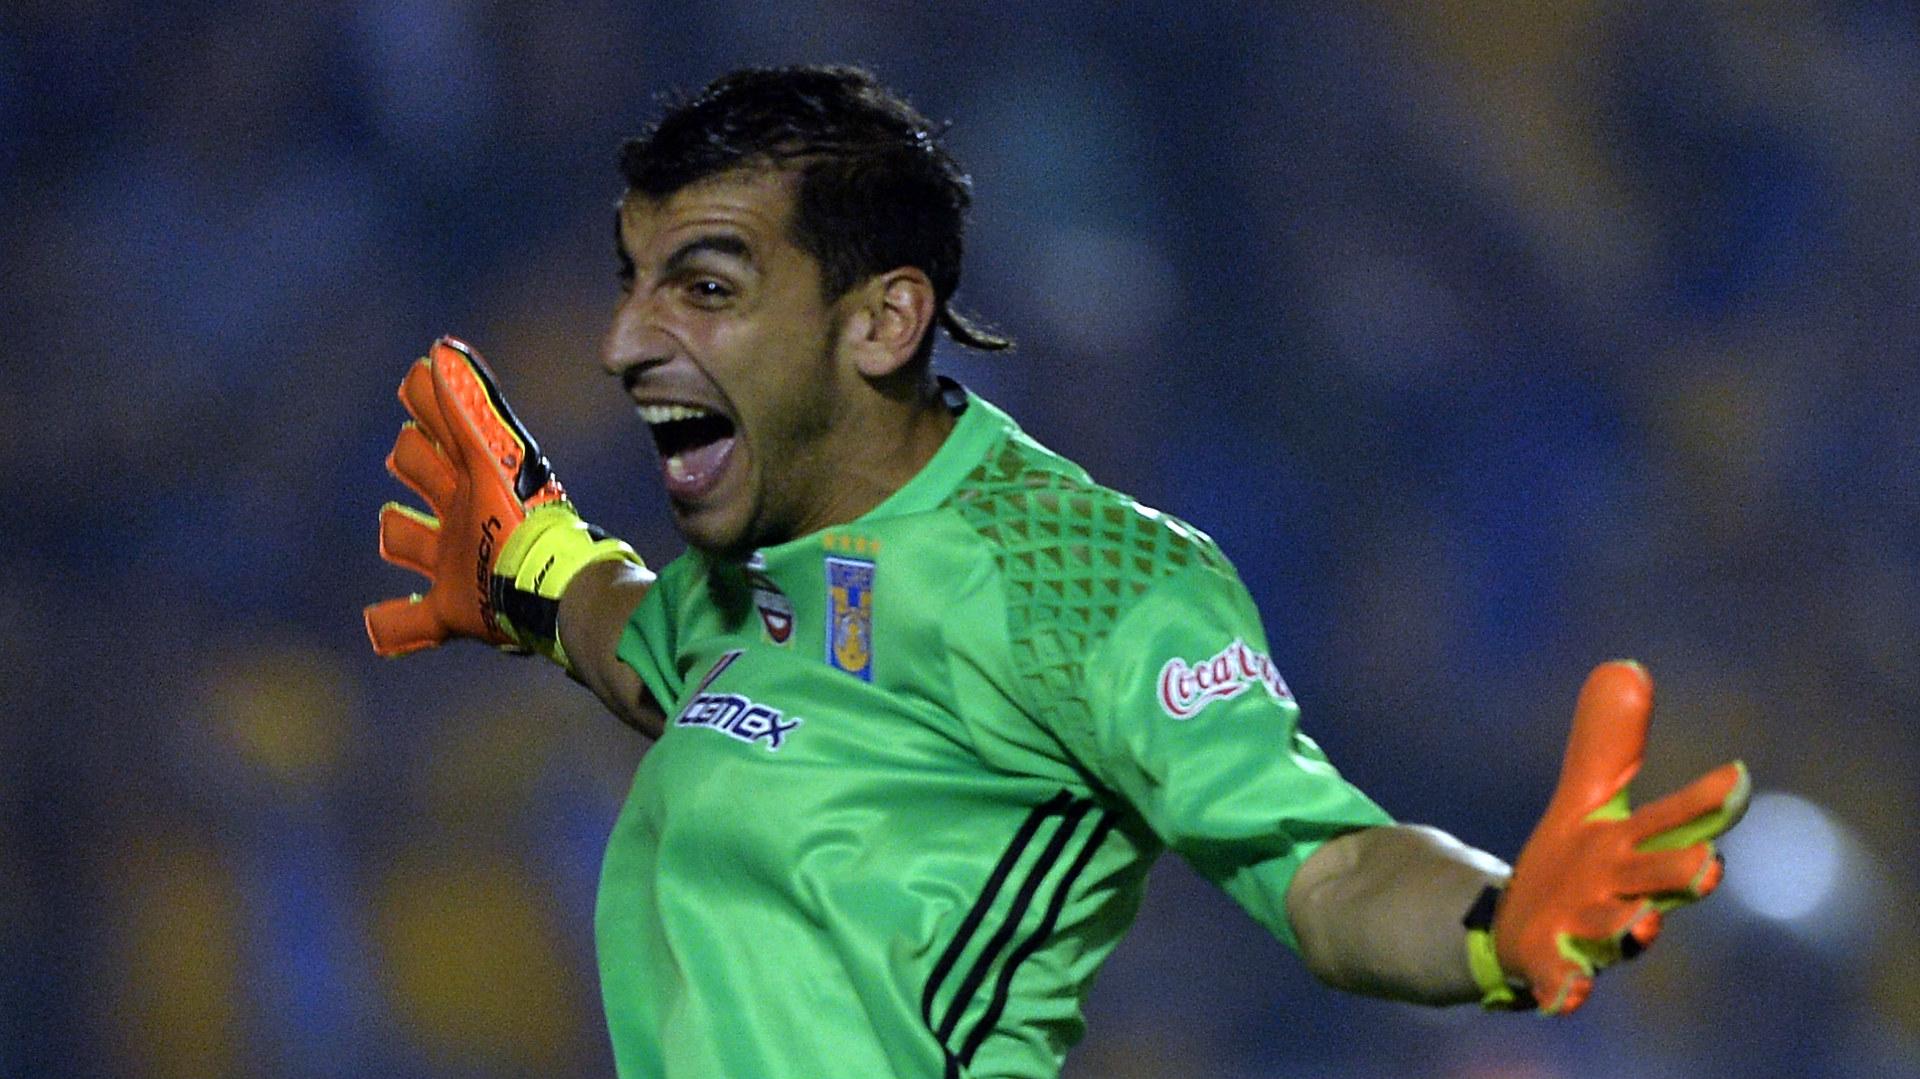 'Monterrey's stadium also belongs to us!' – Tigres star Guzman pokes fun at Liga MX rivals